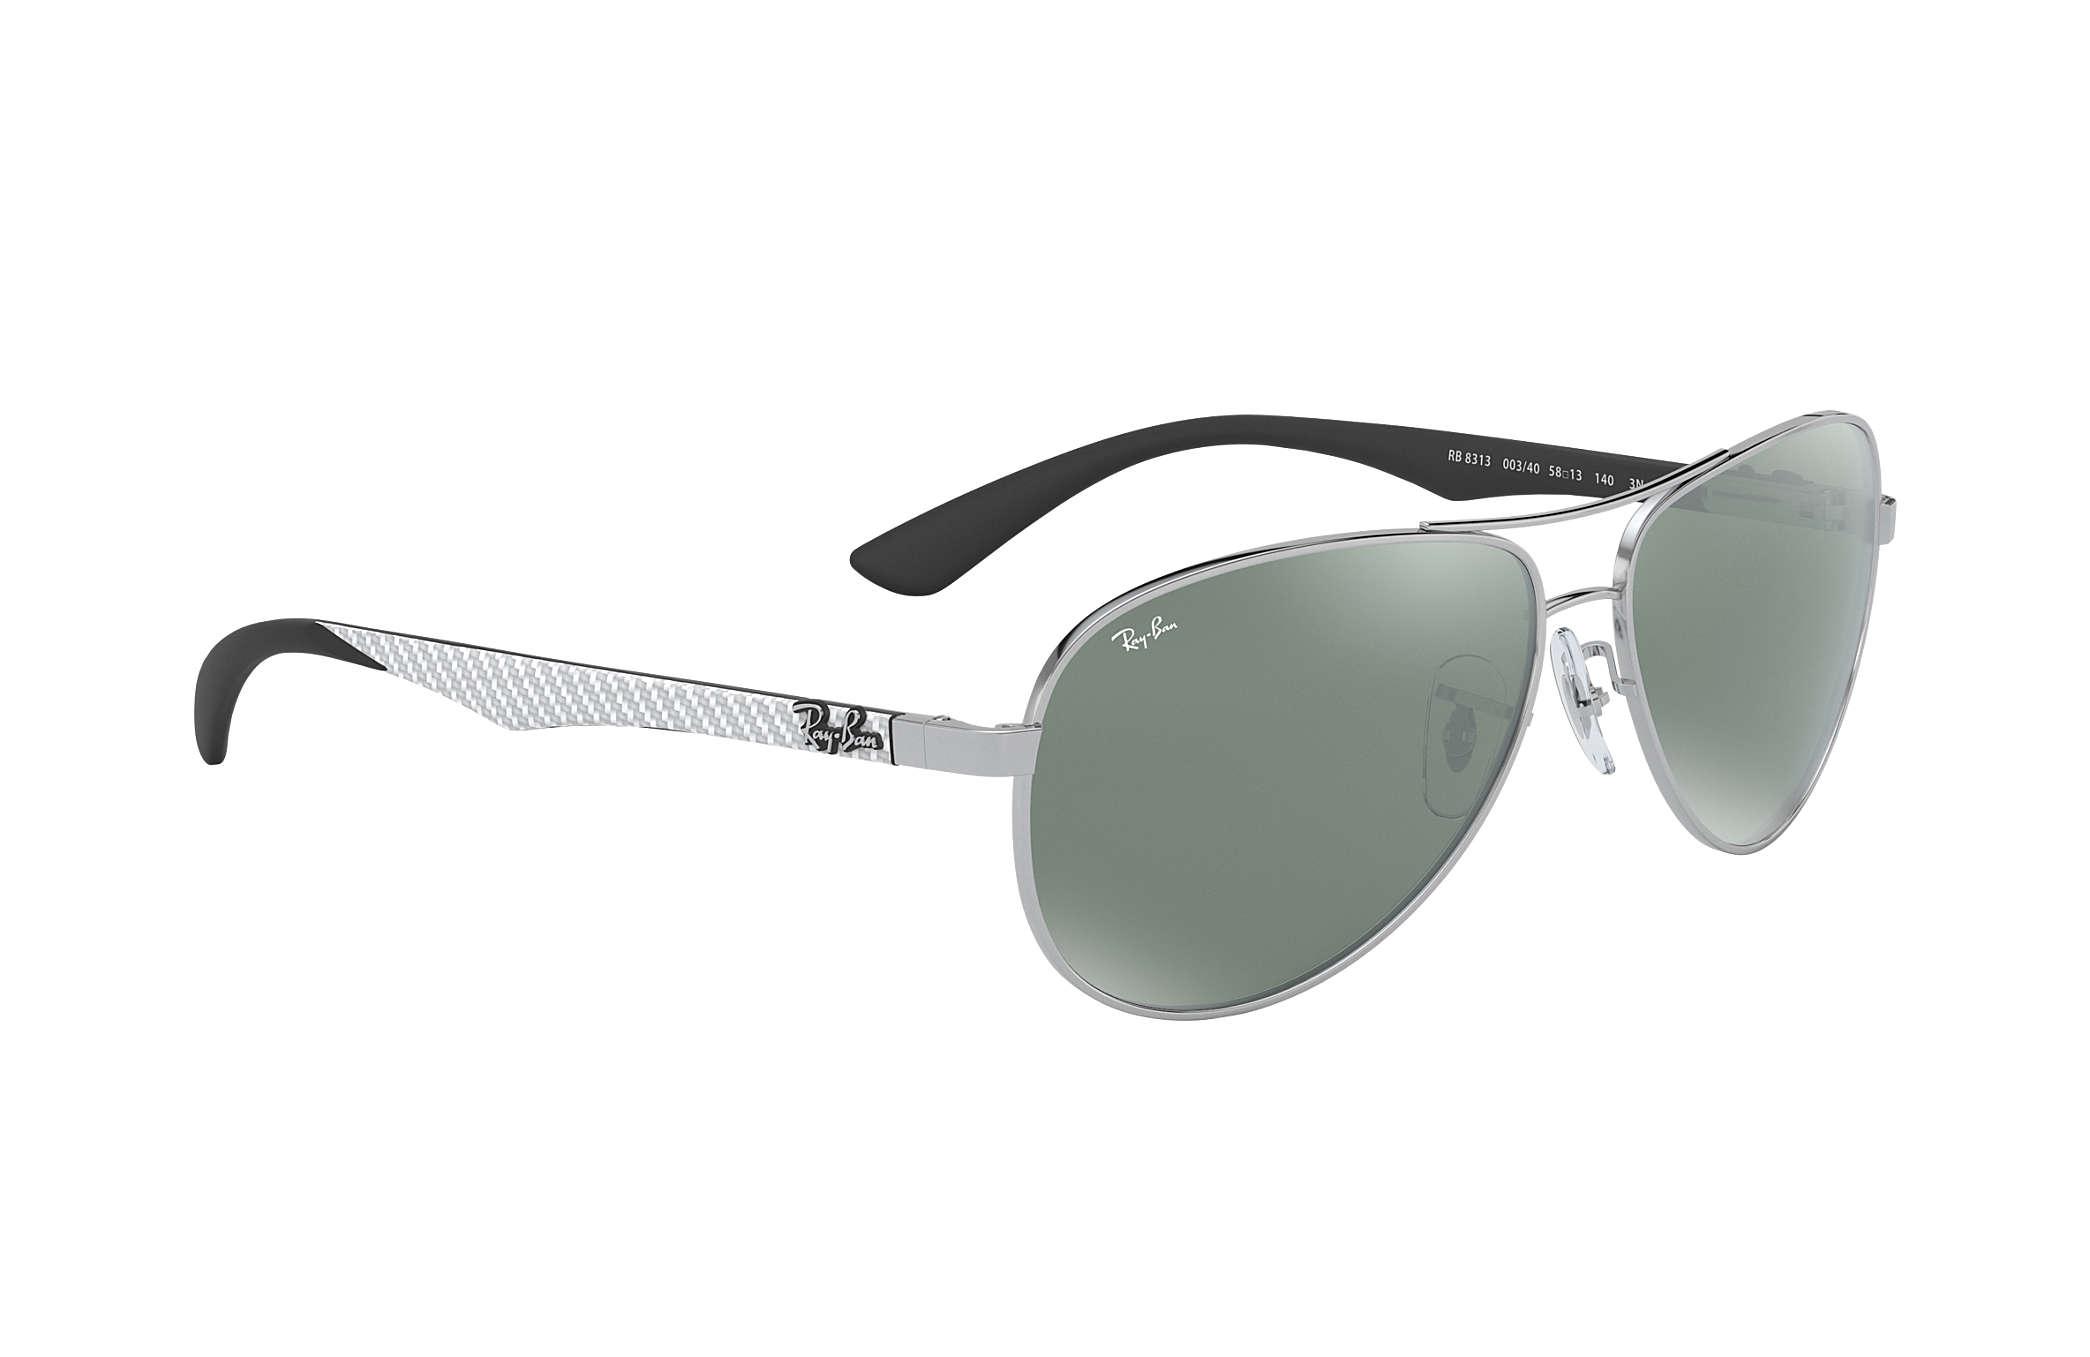 1ebbdb2896005 Ray-Ban RB8313 Silver - Carbon Fibre - Silver Lenses - 0RB8313003 ...